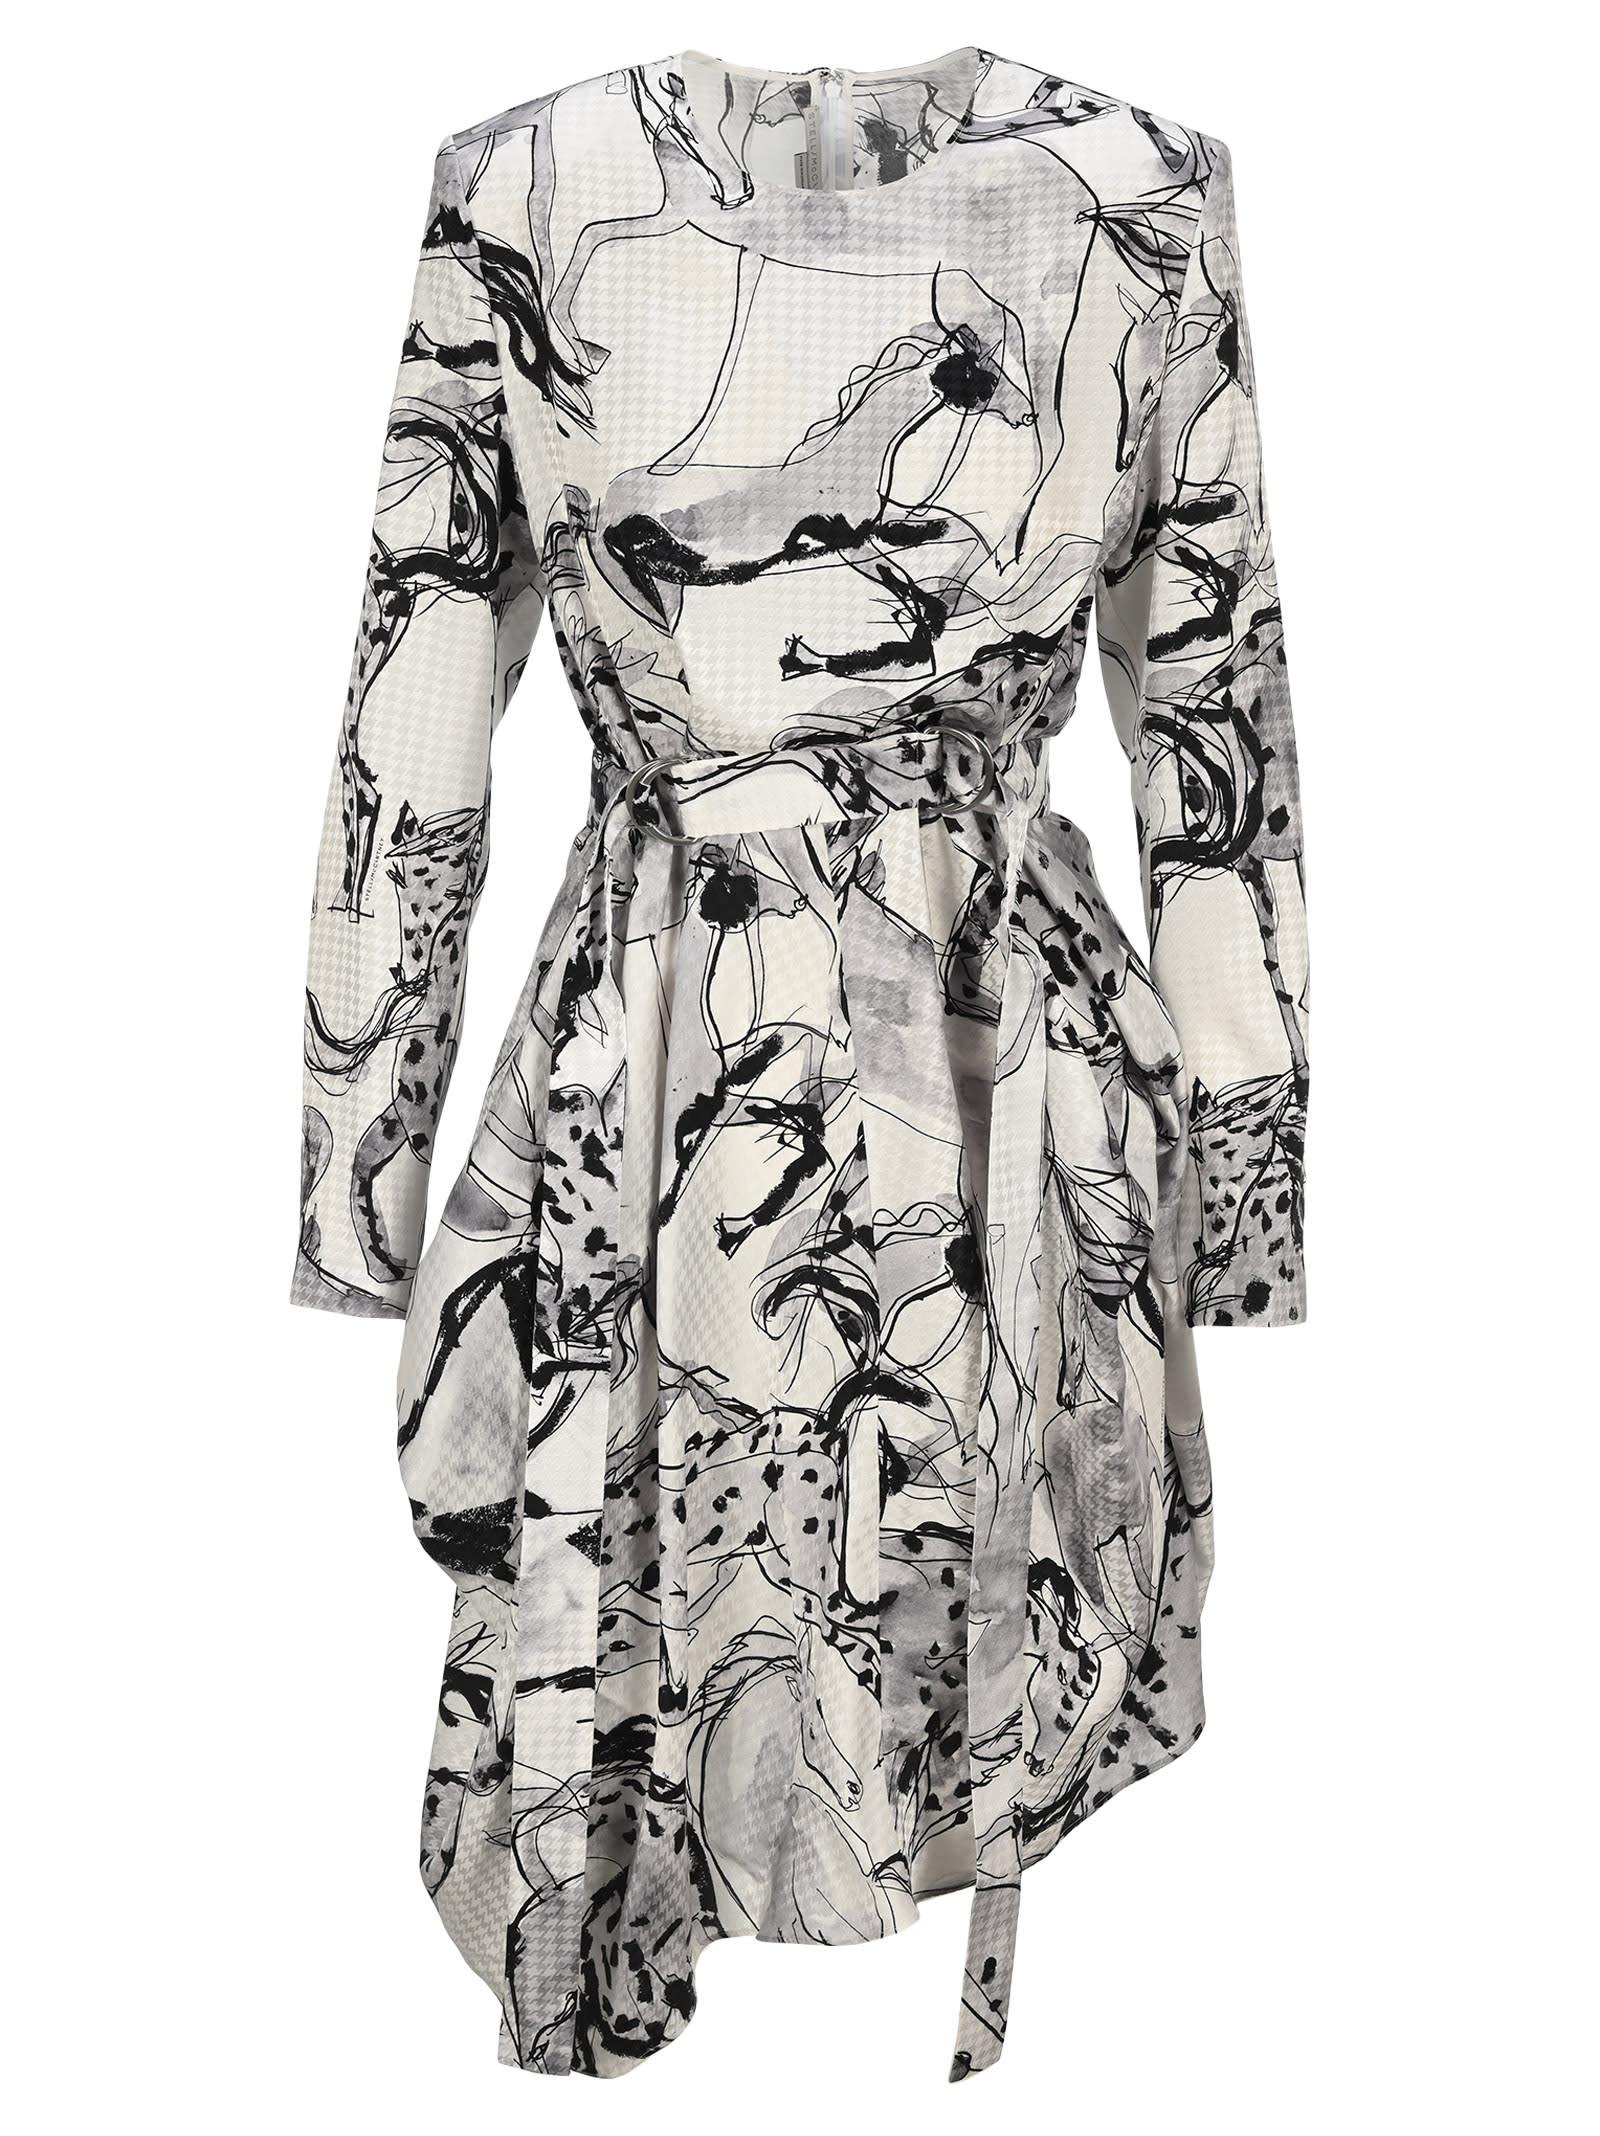 Buy Stella Mccartney Kalyn Dress With Horse Print online, shop Stella McCartney with free shipping